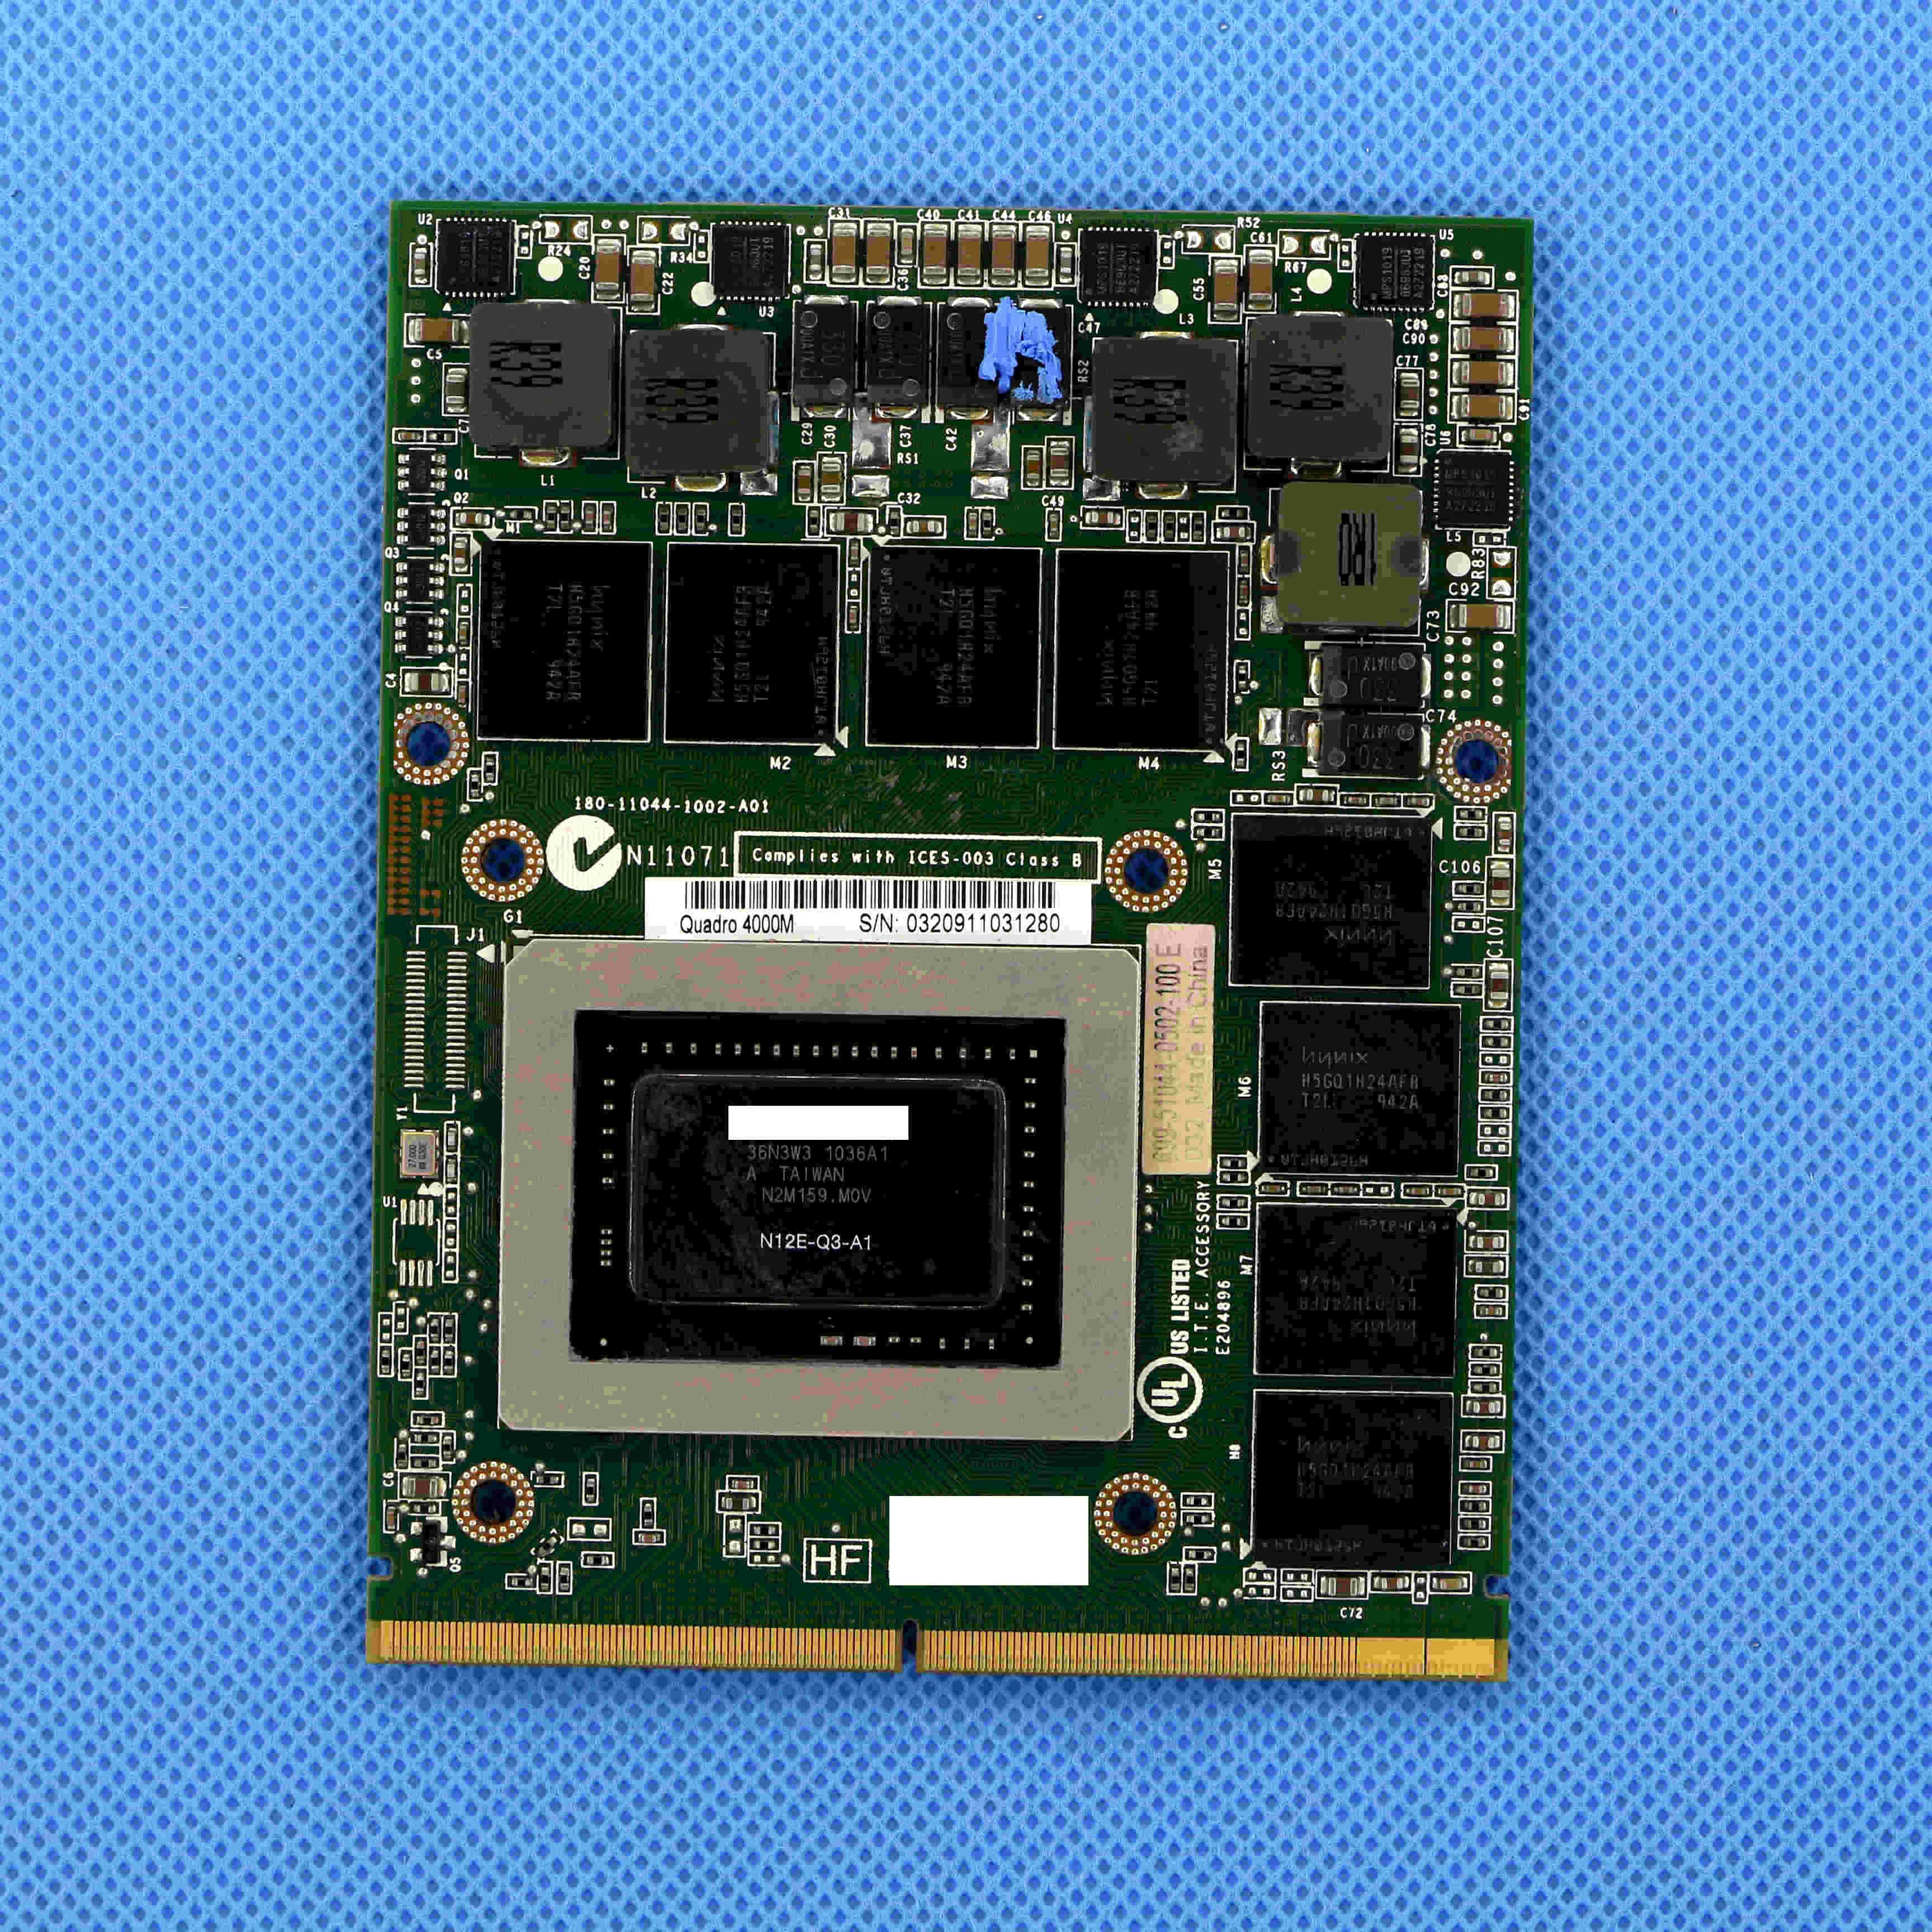 Genuine New 4000m Q4000M 2GB GDDR5 MXM 3.0b Video Card For Clevo P150HM P170HM P150EM P170HM